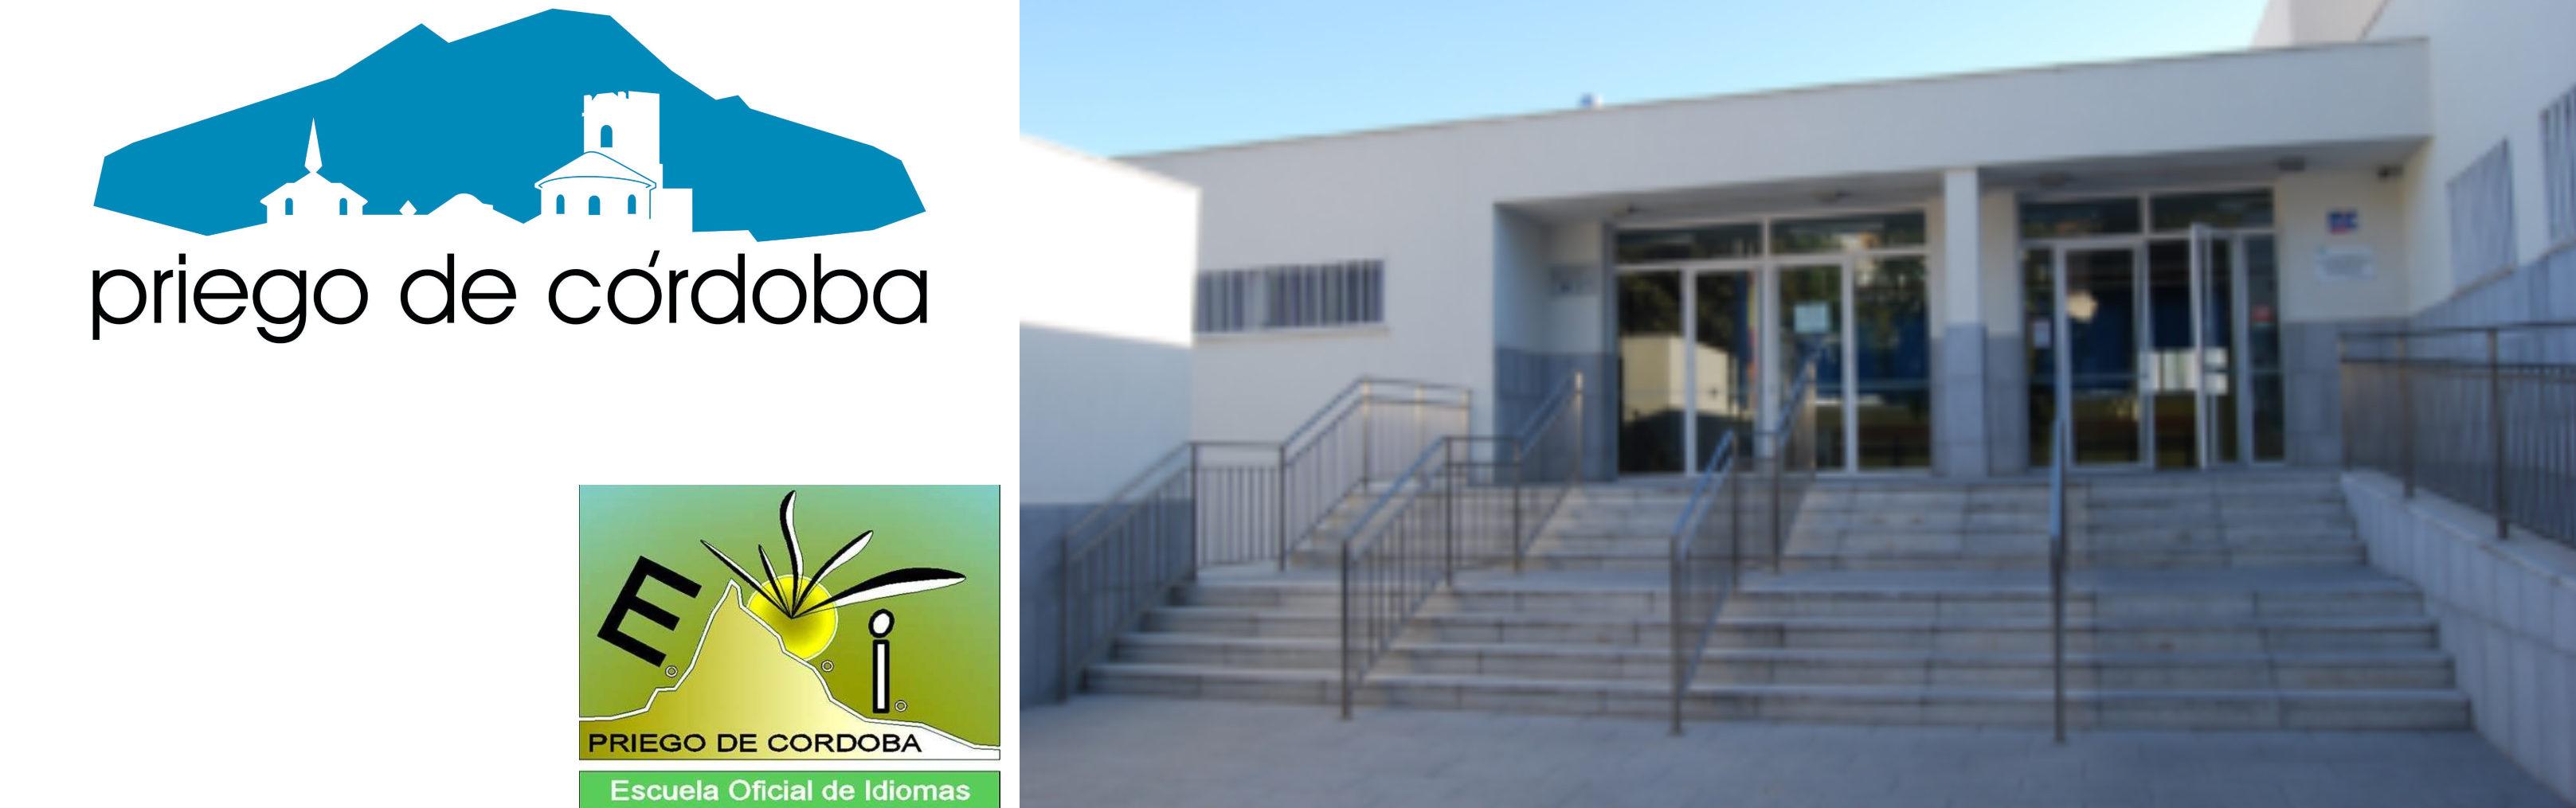 Escuela Oficial de Idiomas Priego de Córdoba